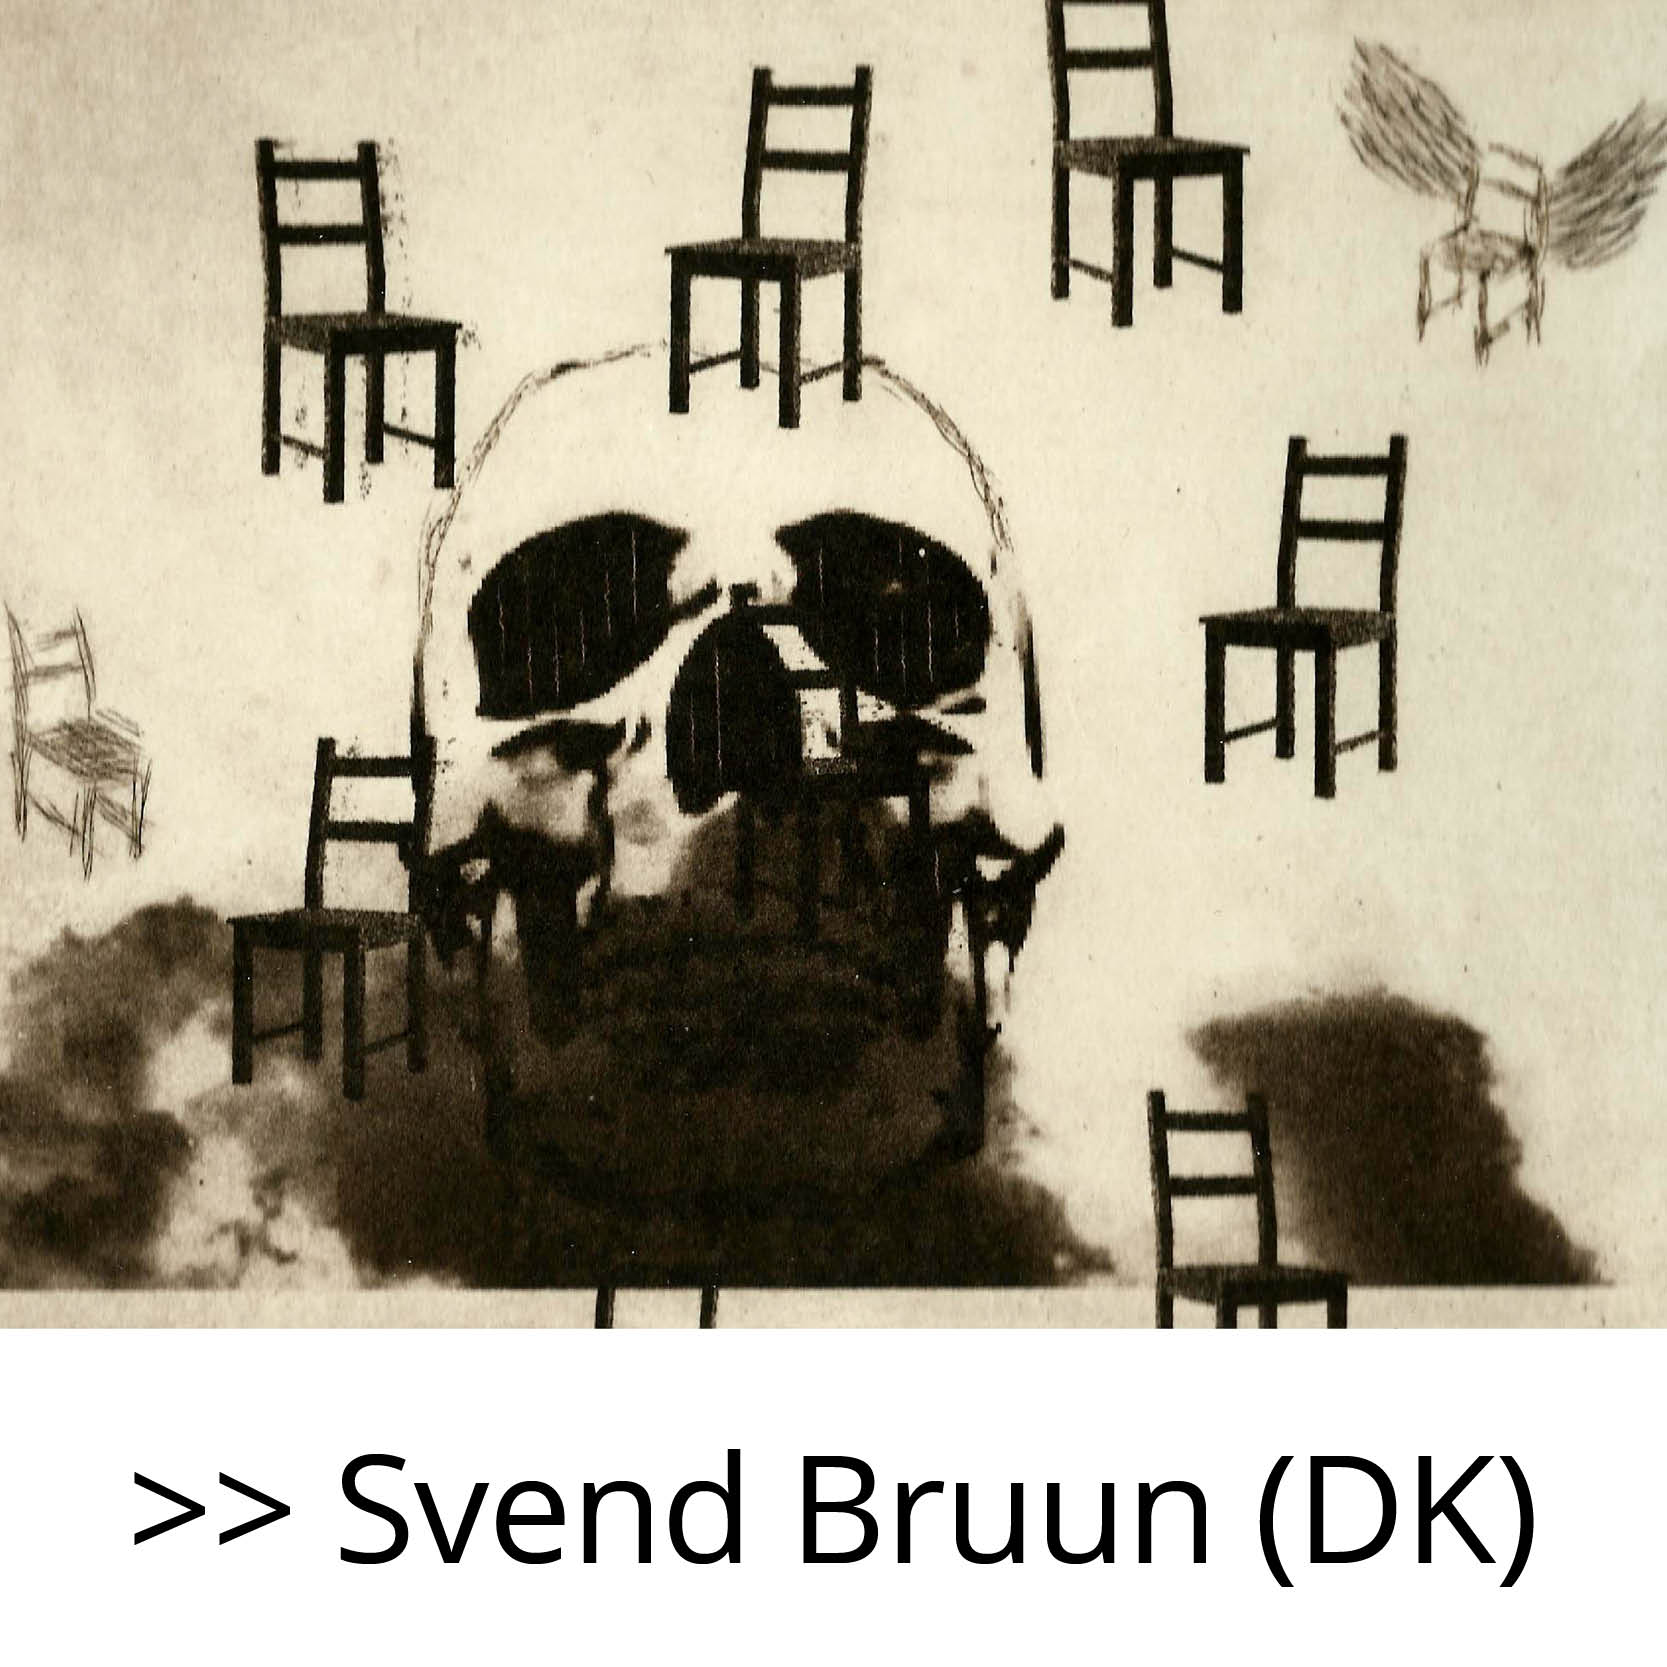 Svend_Bruun_(DK)